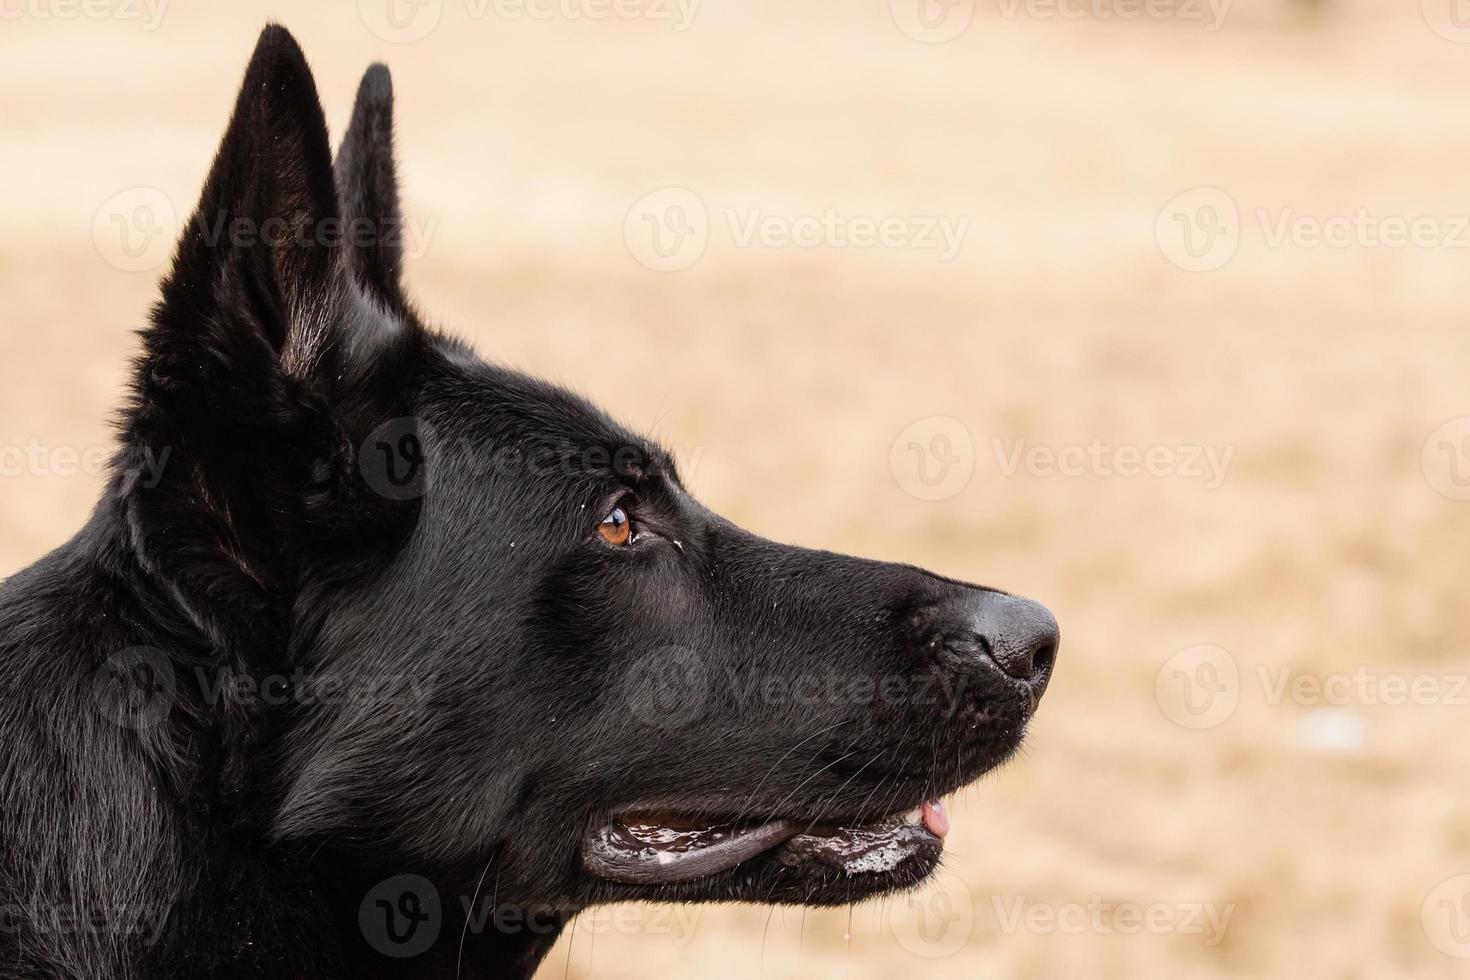 pastor alemán negro foto